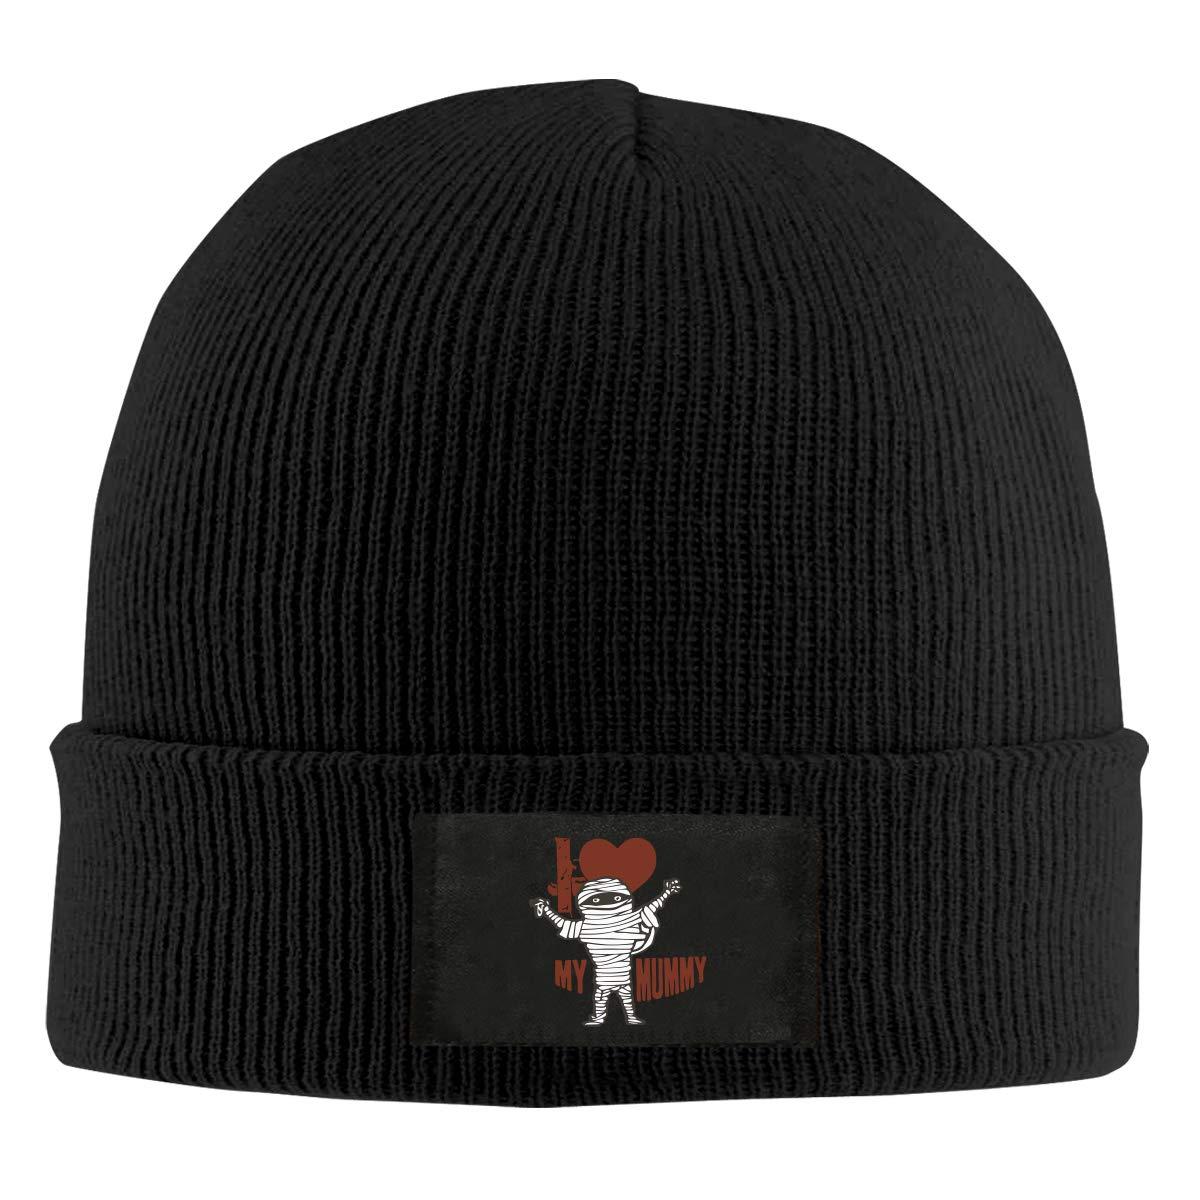 I Love My Mummy Winter Knitted Hat Warm Wool Skull Beanie Cap